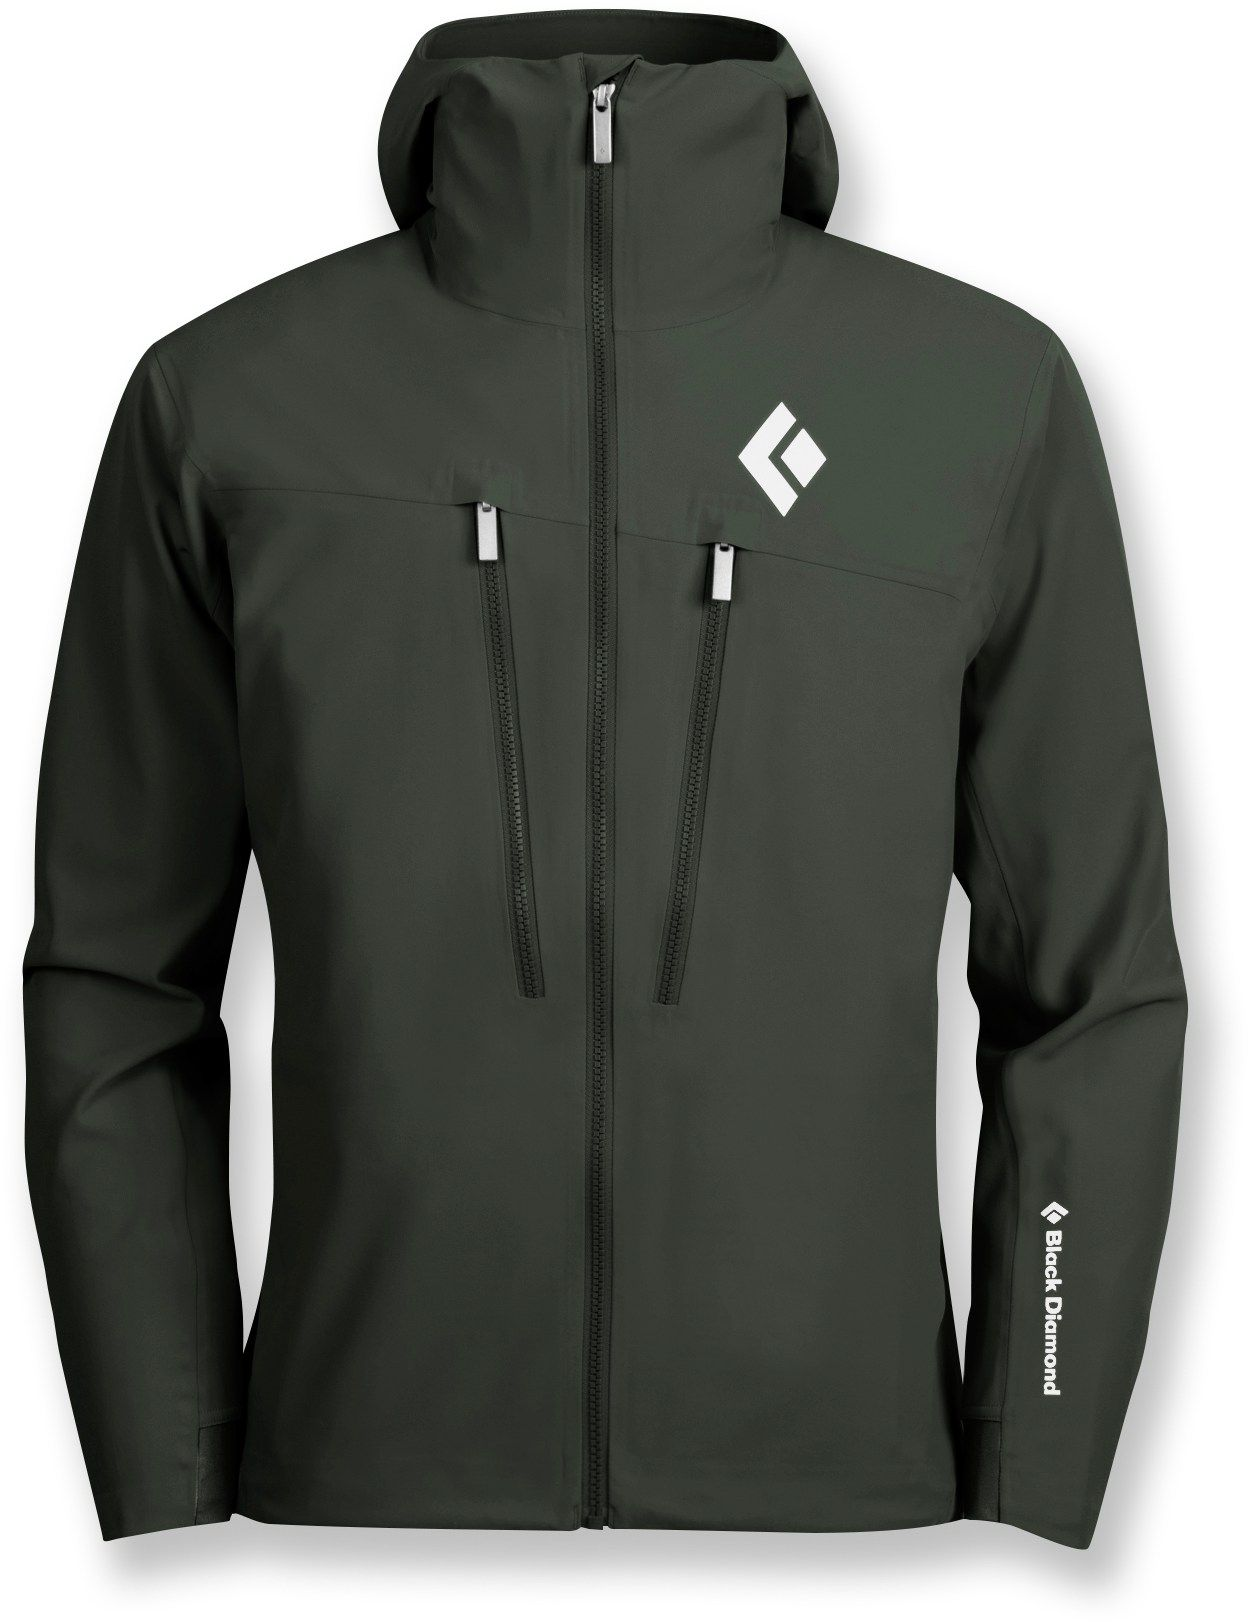 Black Diamond Male Induction SoftShell Jacket Men's